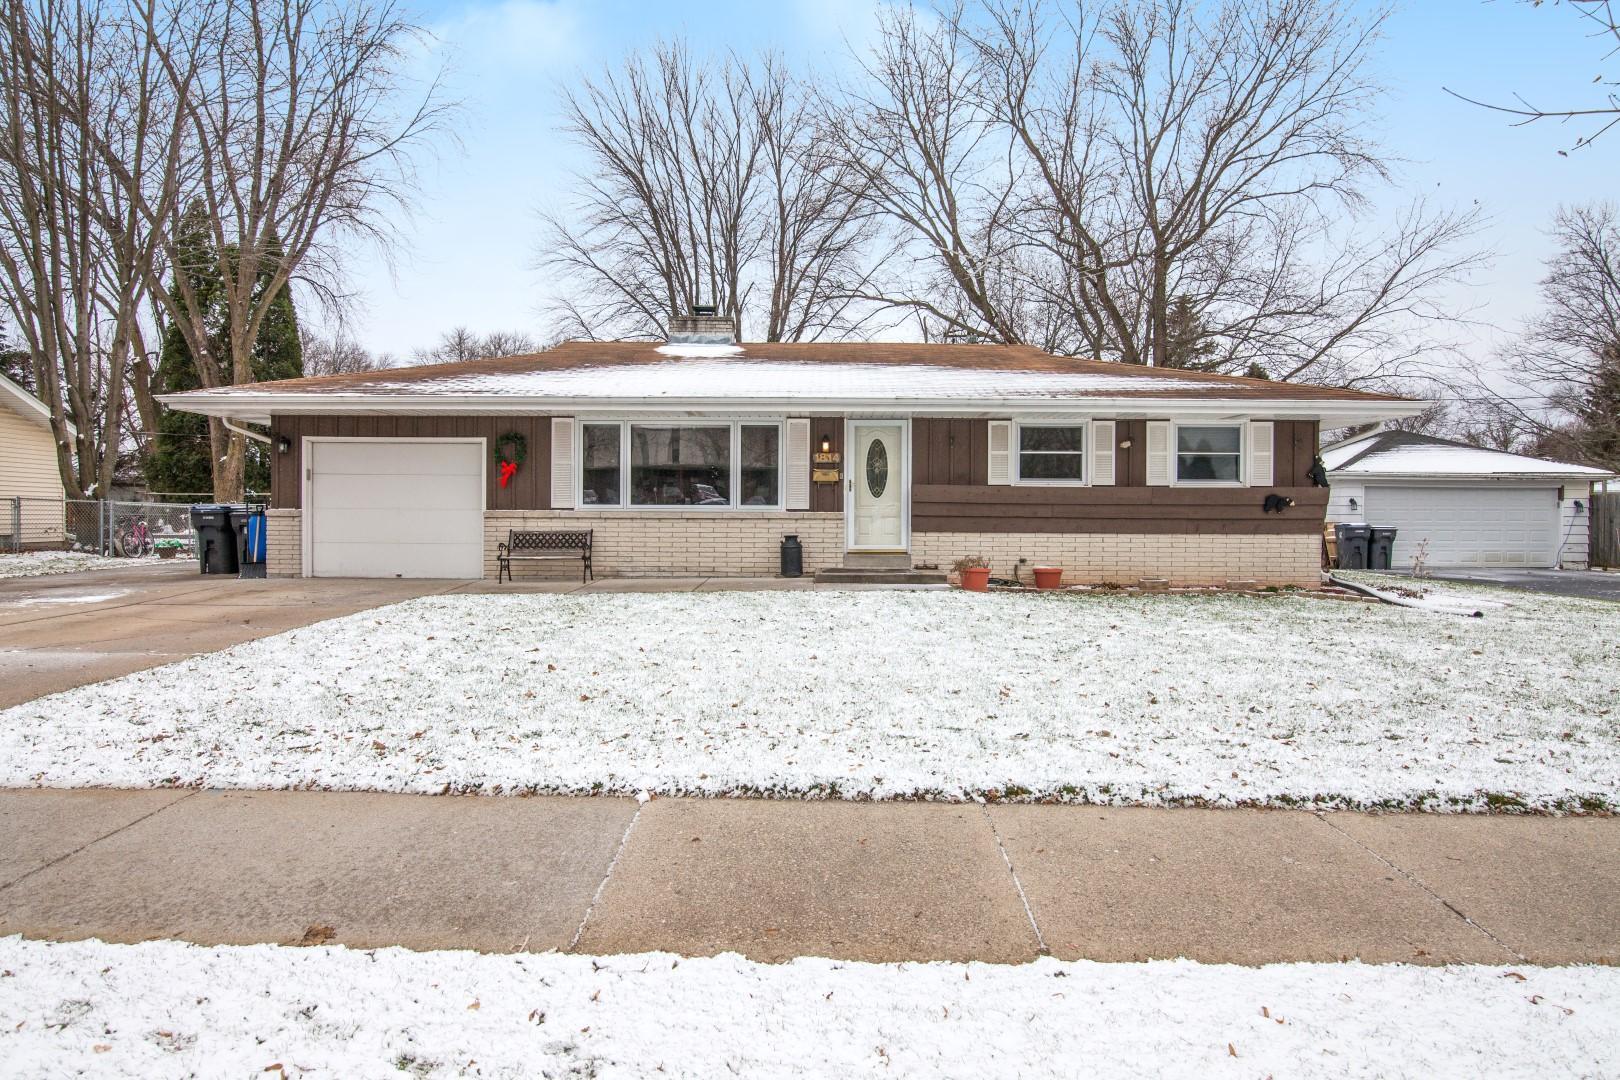 1814 Butler Dr, Waukesha, Wisconsin 53186, 3 Bedrooms Bedrooms, 6 Rooms Rooms,1 BathroomBathrooms,Single-Family,For Sale,Butler Dr,1615430